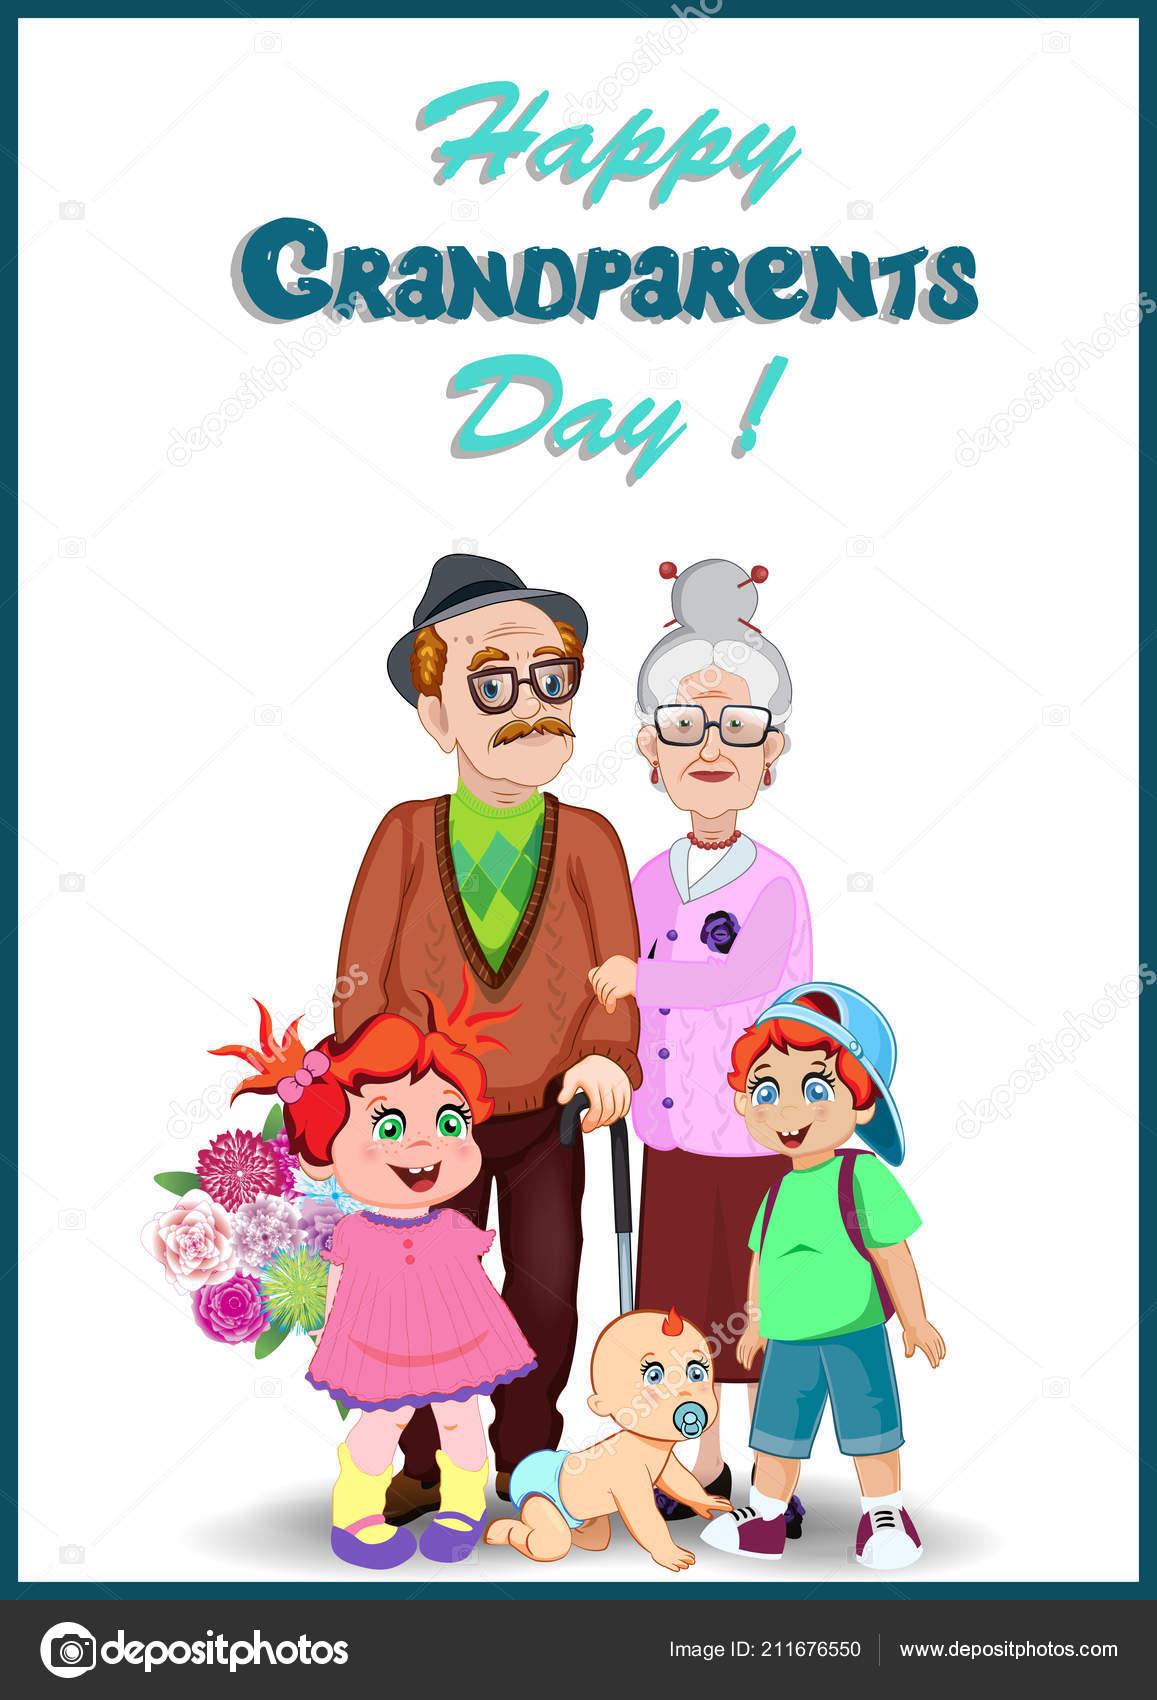 Happy Grandparents Day Greeting Card Cartoon Vector Illustration